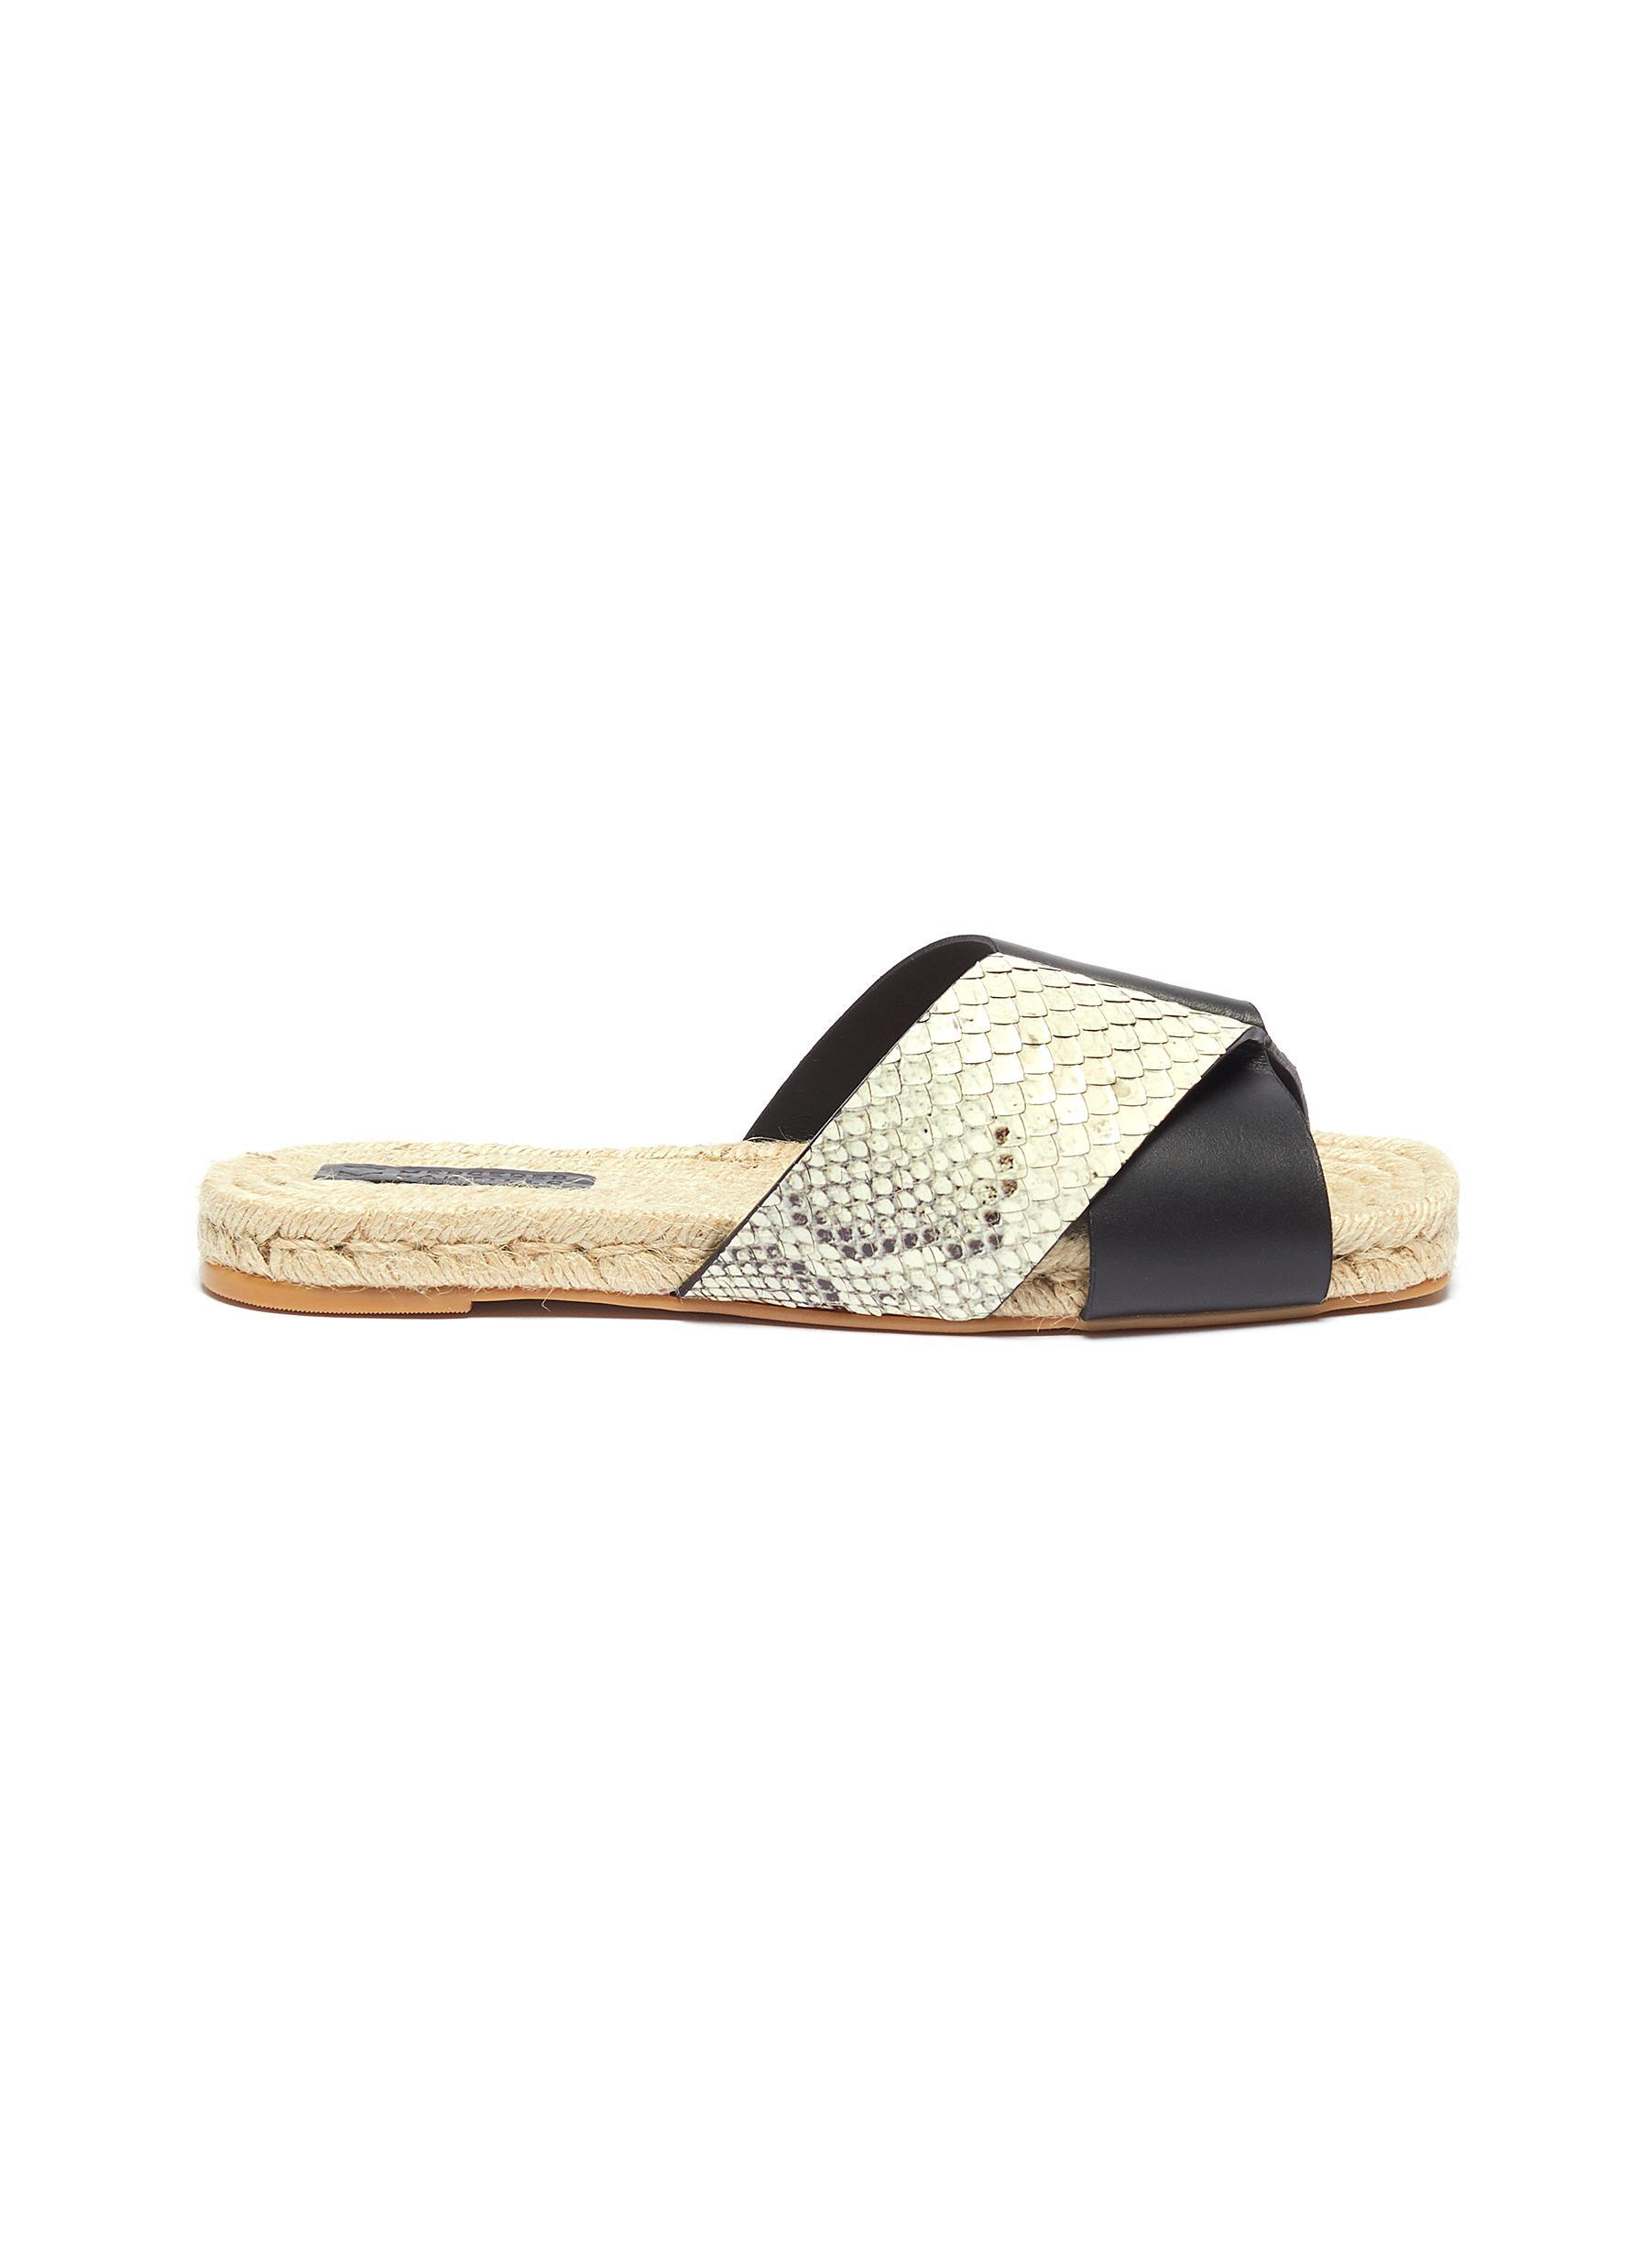 Xane colourblock cross strap leather espadrille slide sandals by Mercedes Castillo